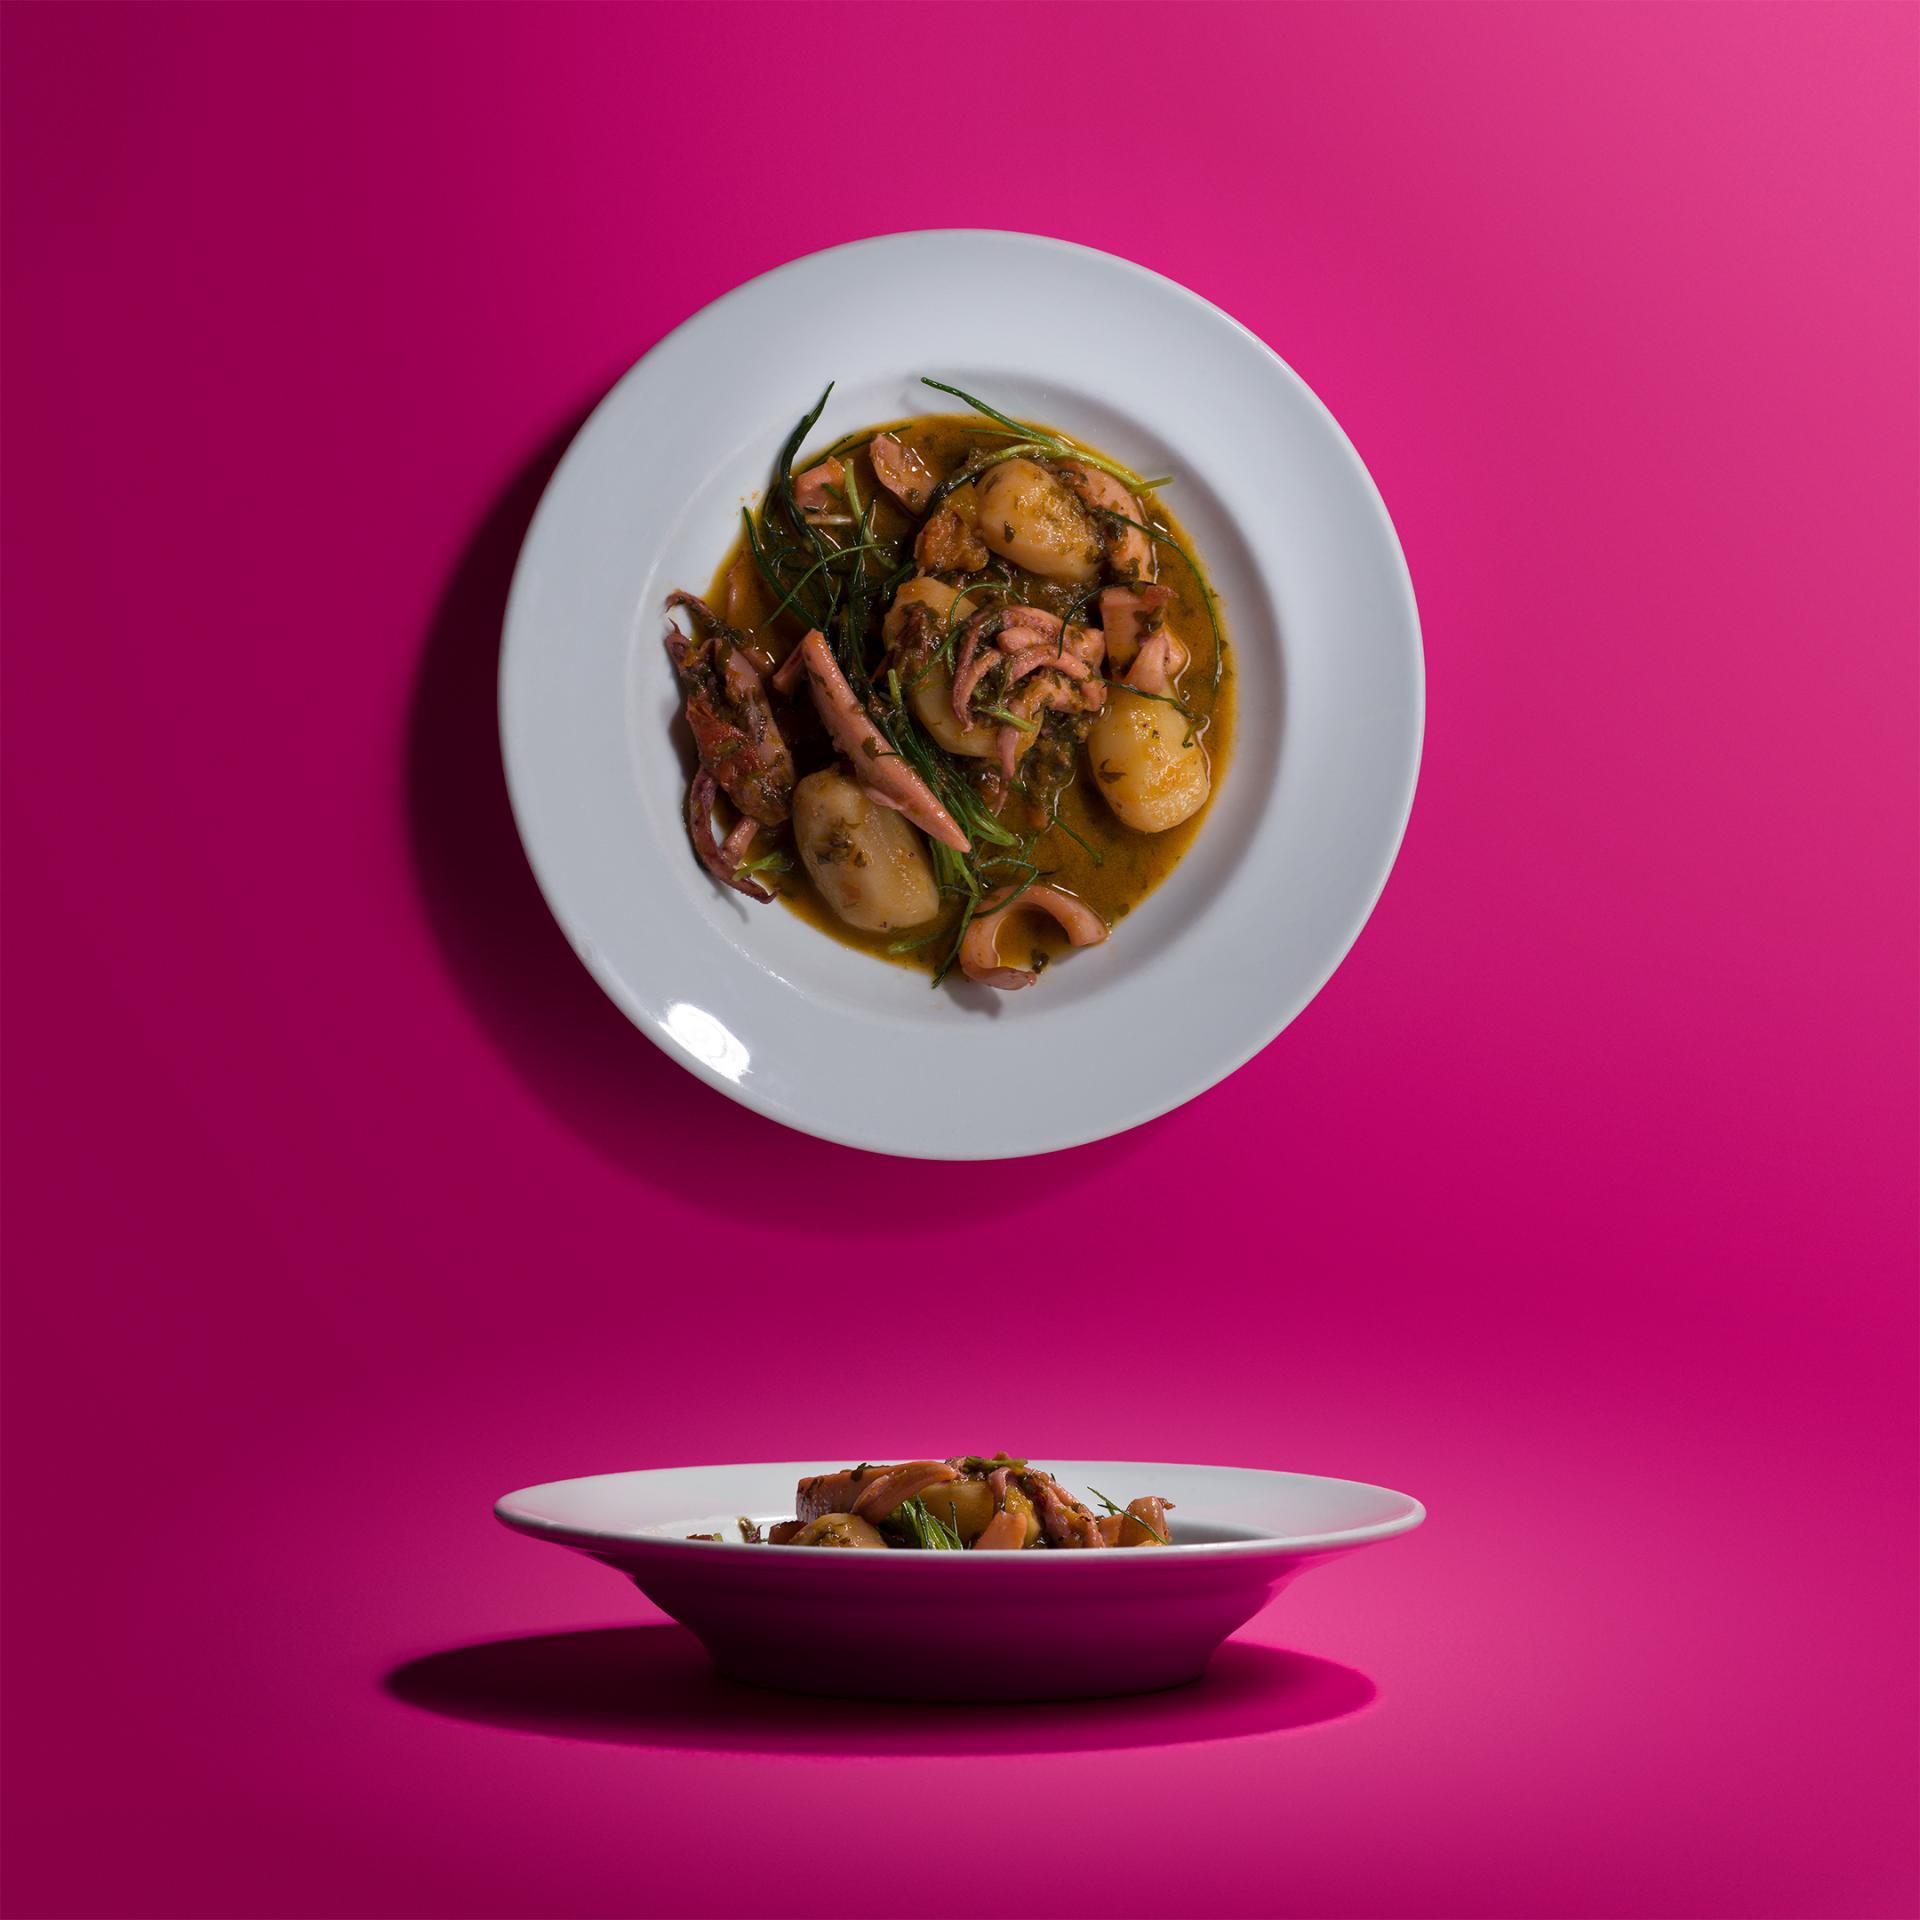 Margot Henderson's braised squid and potato